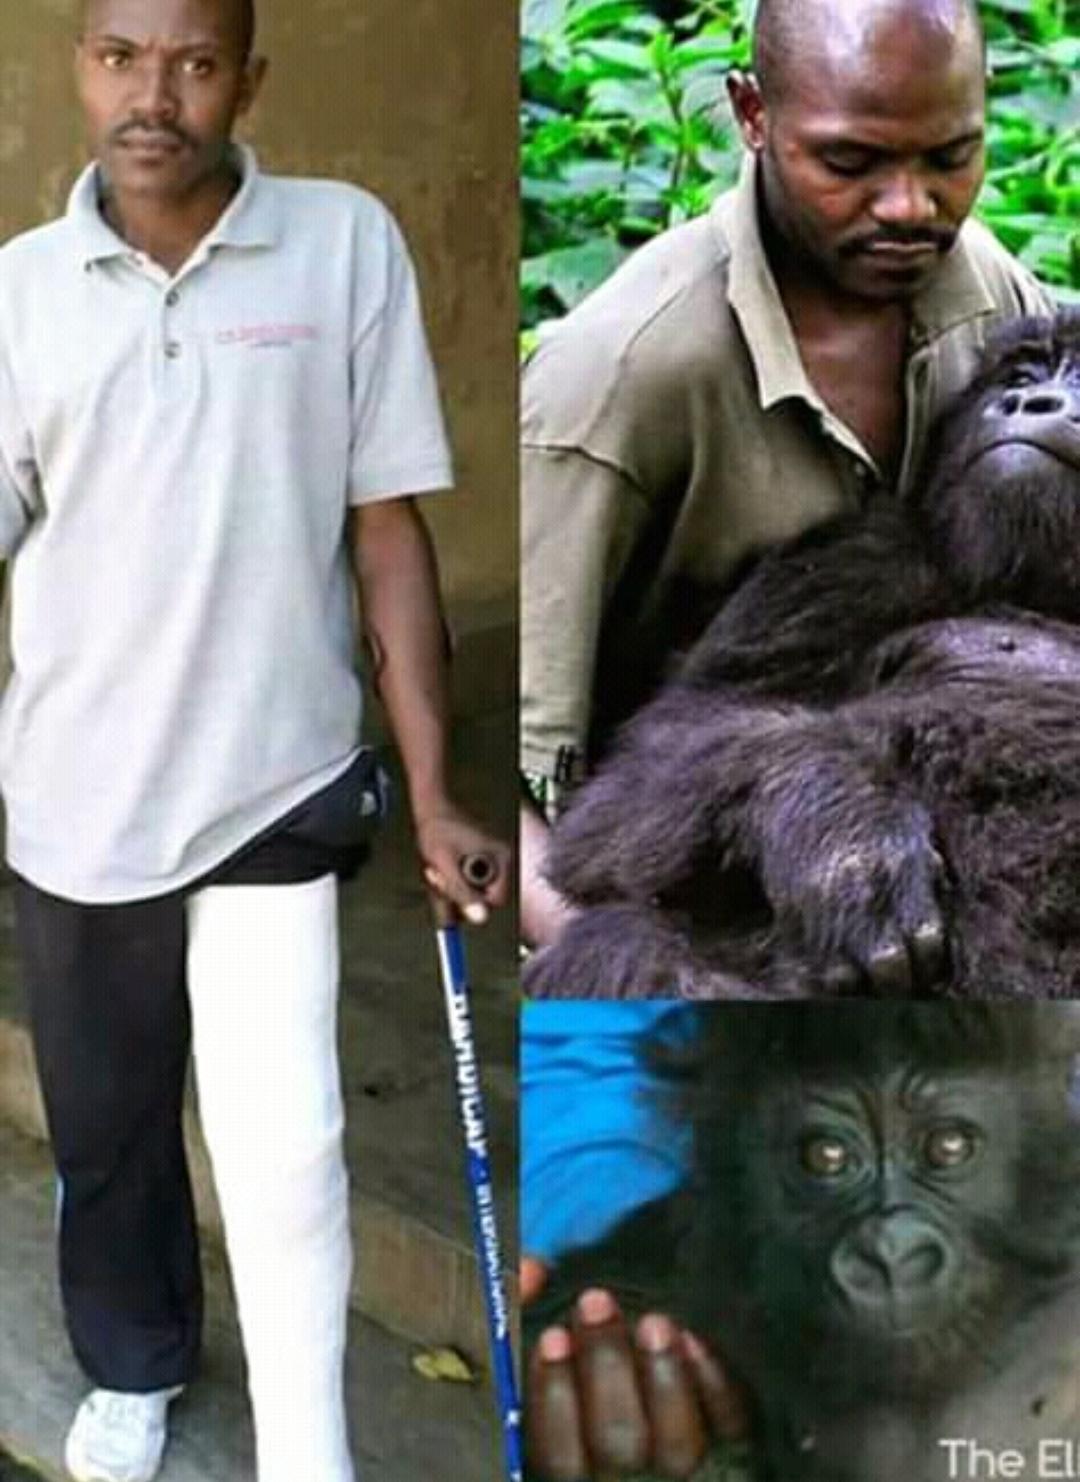 ranger gorilla virunga - eticoscienza